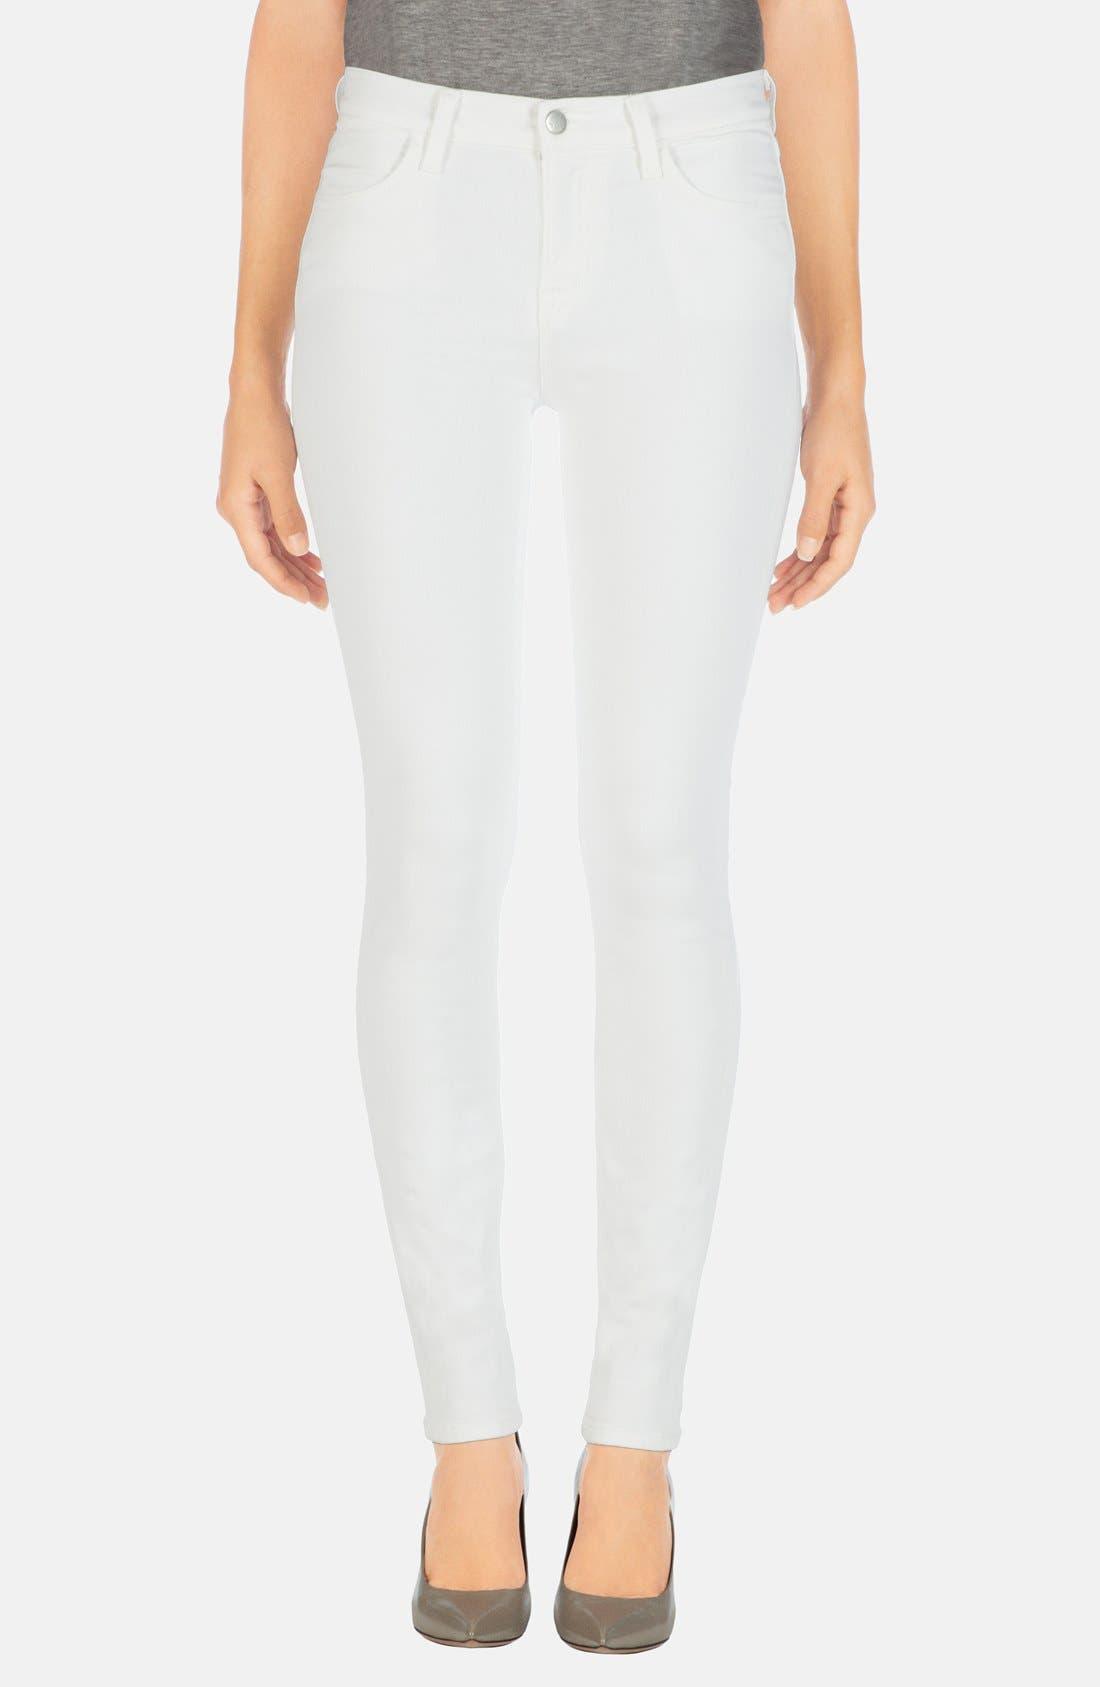 2311 Maria High Waist Super Skinny Jeans,                             Alternate thumbnail 8, color,                             BLANC